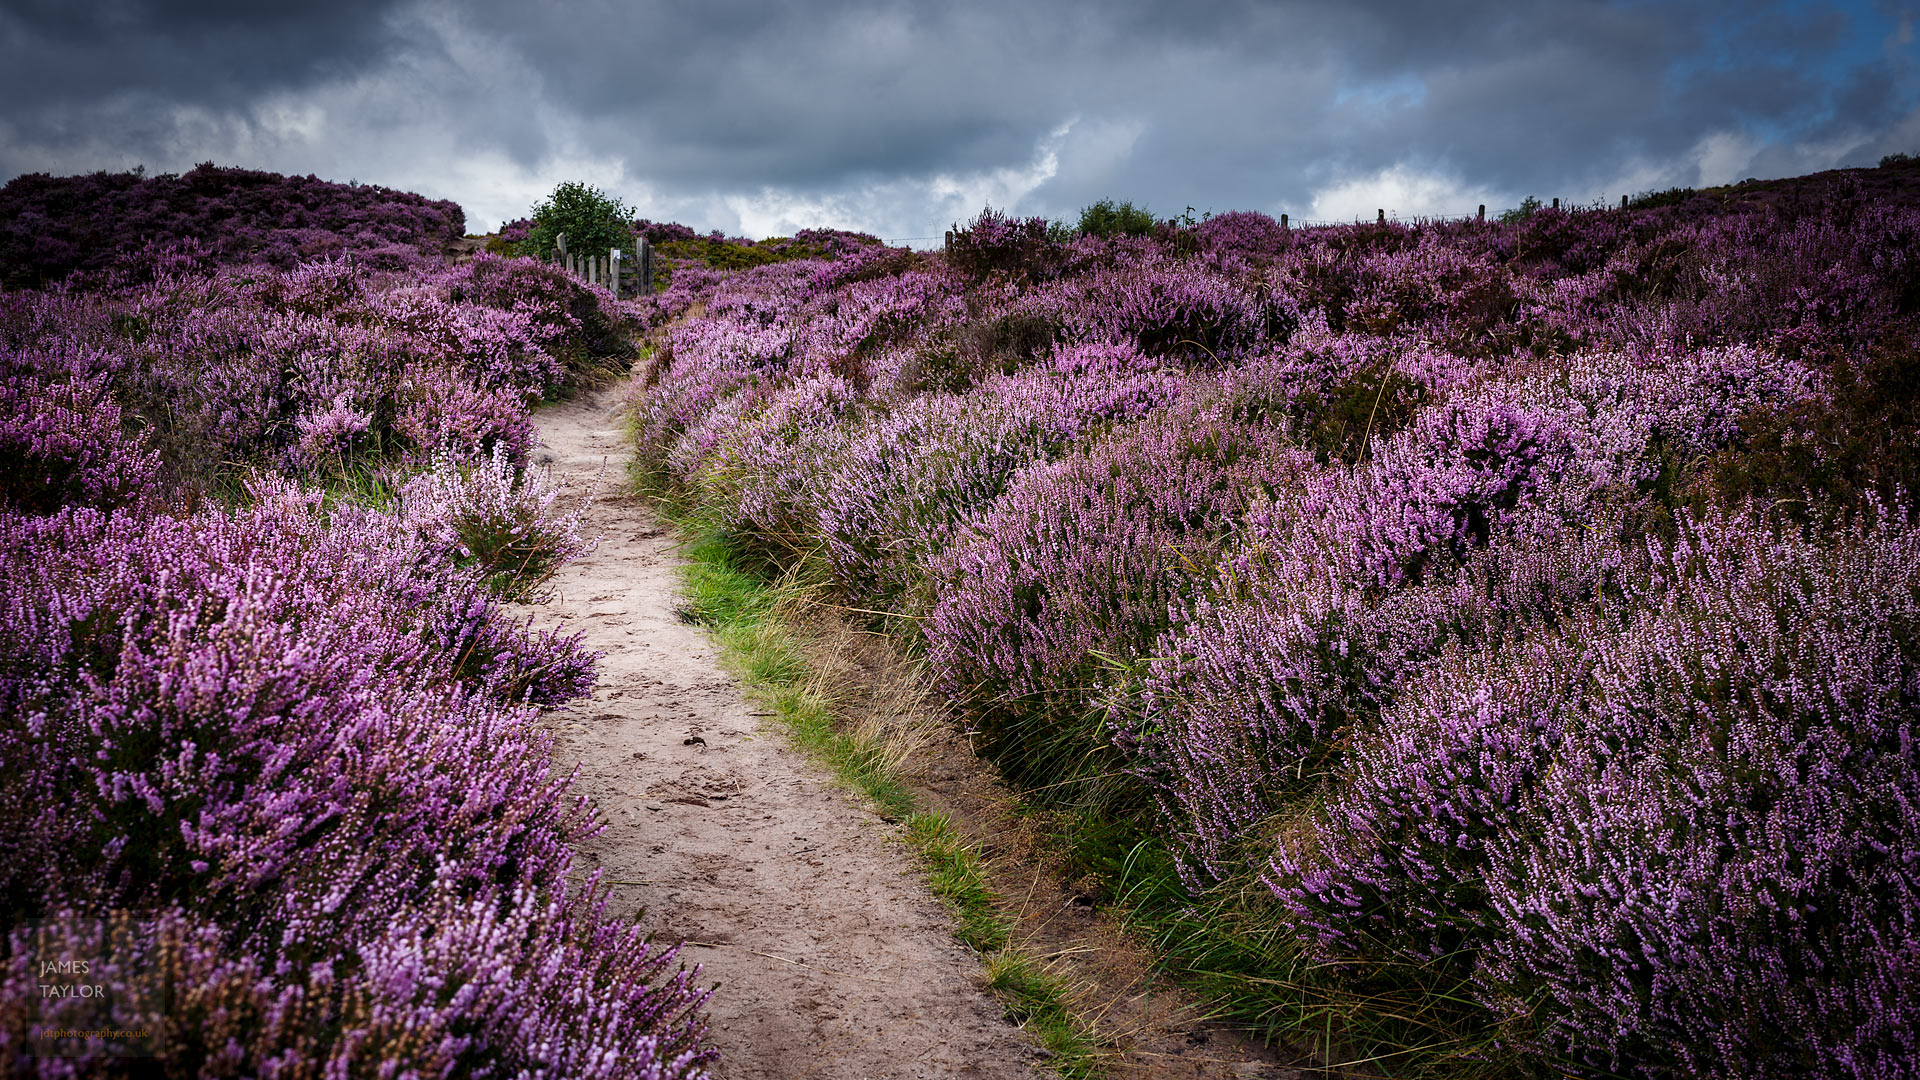 jdtphotography.co.uk knee deep purple heather